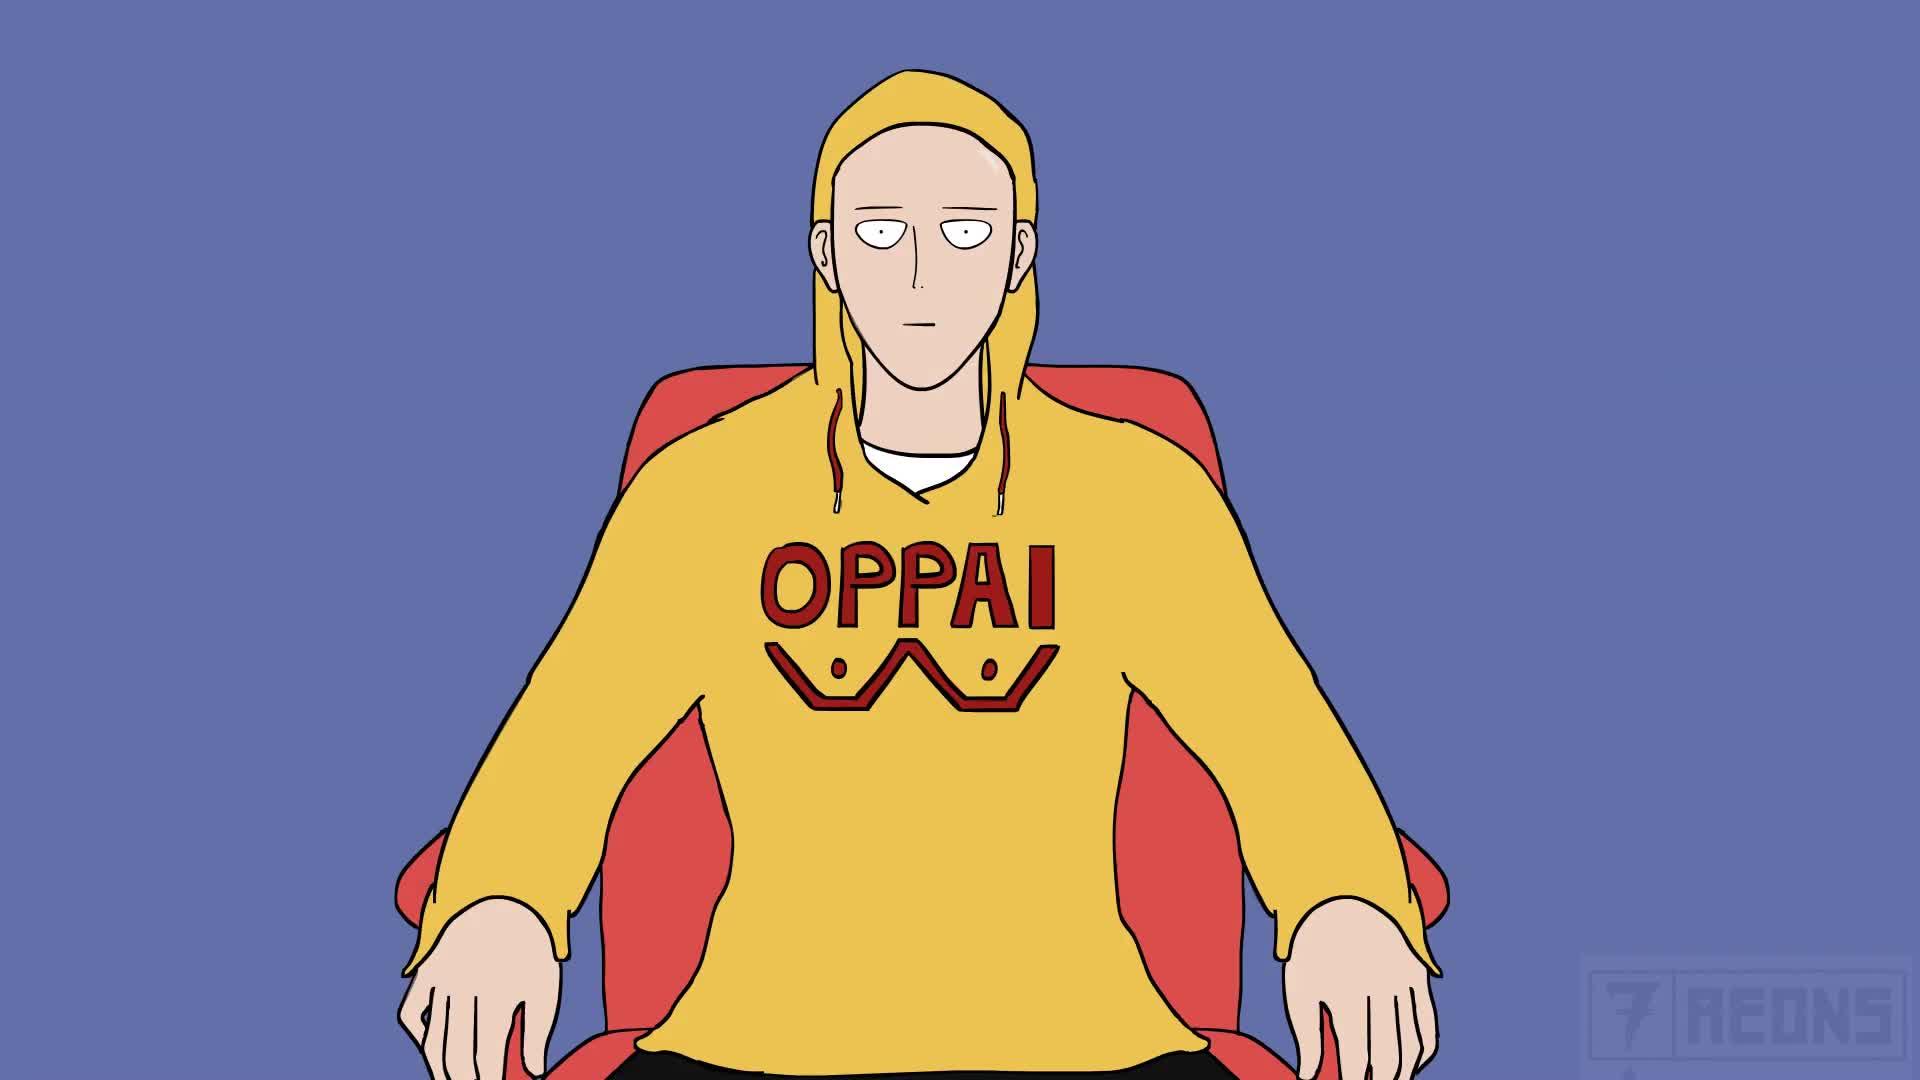 7 aeons, Saitama, adobe animate, adobe flash, adobeanimate, adobeflash, anime, animefunny, animememes, ginseng, indie musician, memes, one punch man, one punch man season 2, one-punch man, onepunchman, onepunchmanmemes, oppal hoodie, One Punch Ginger GIFs